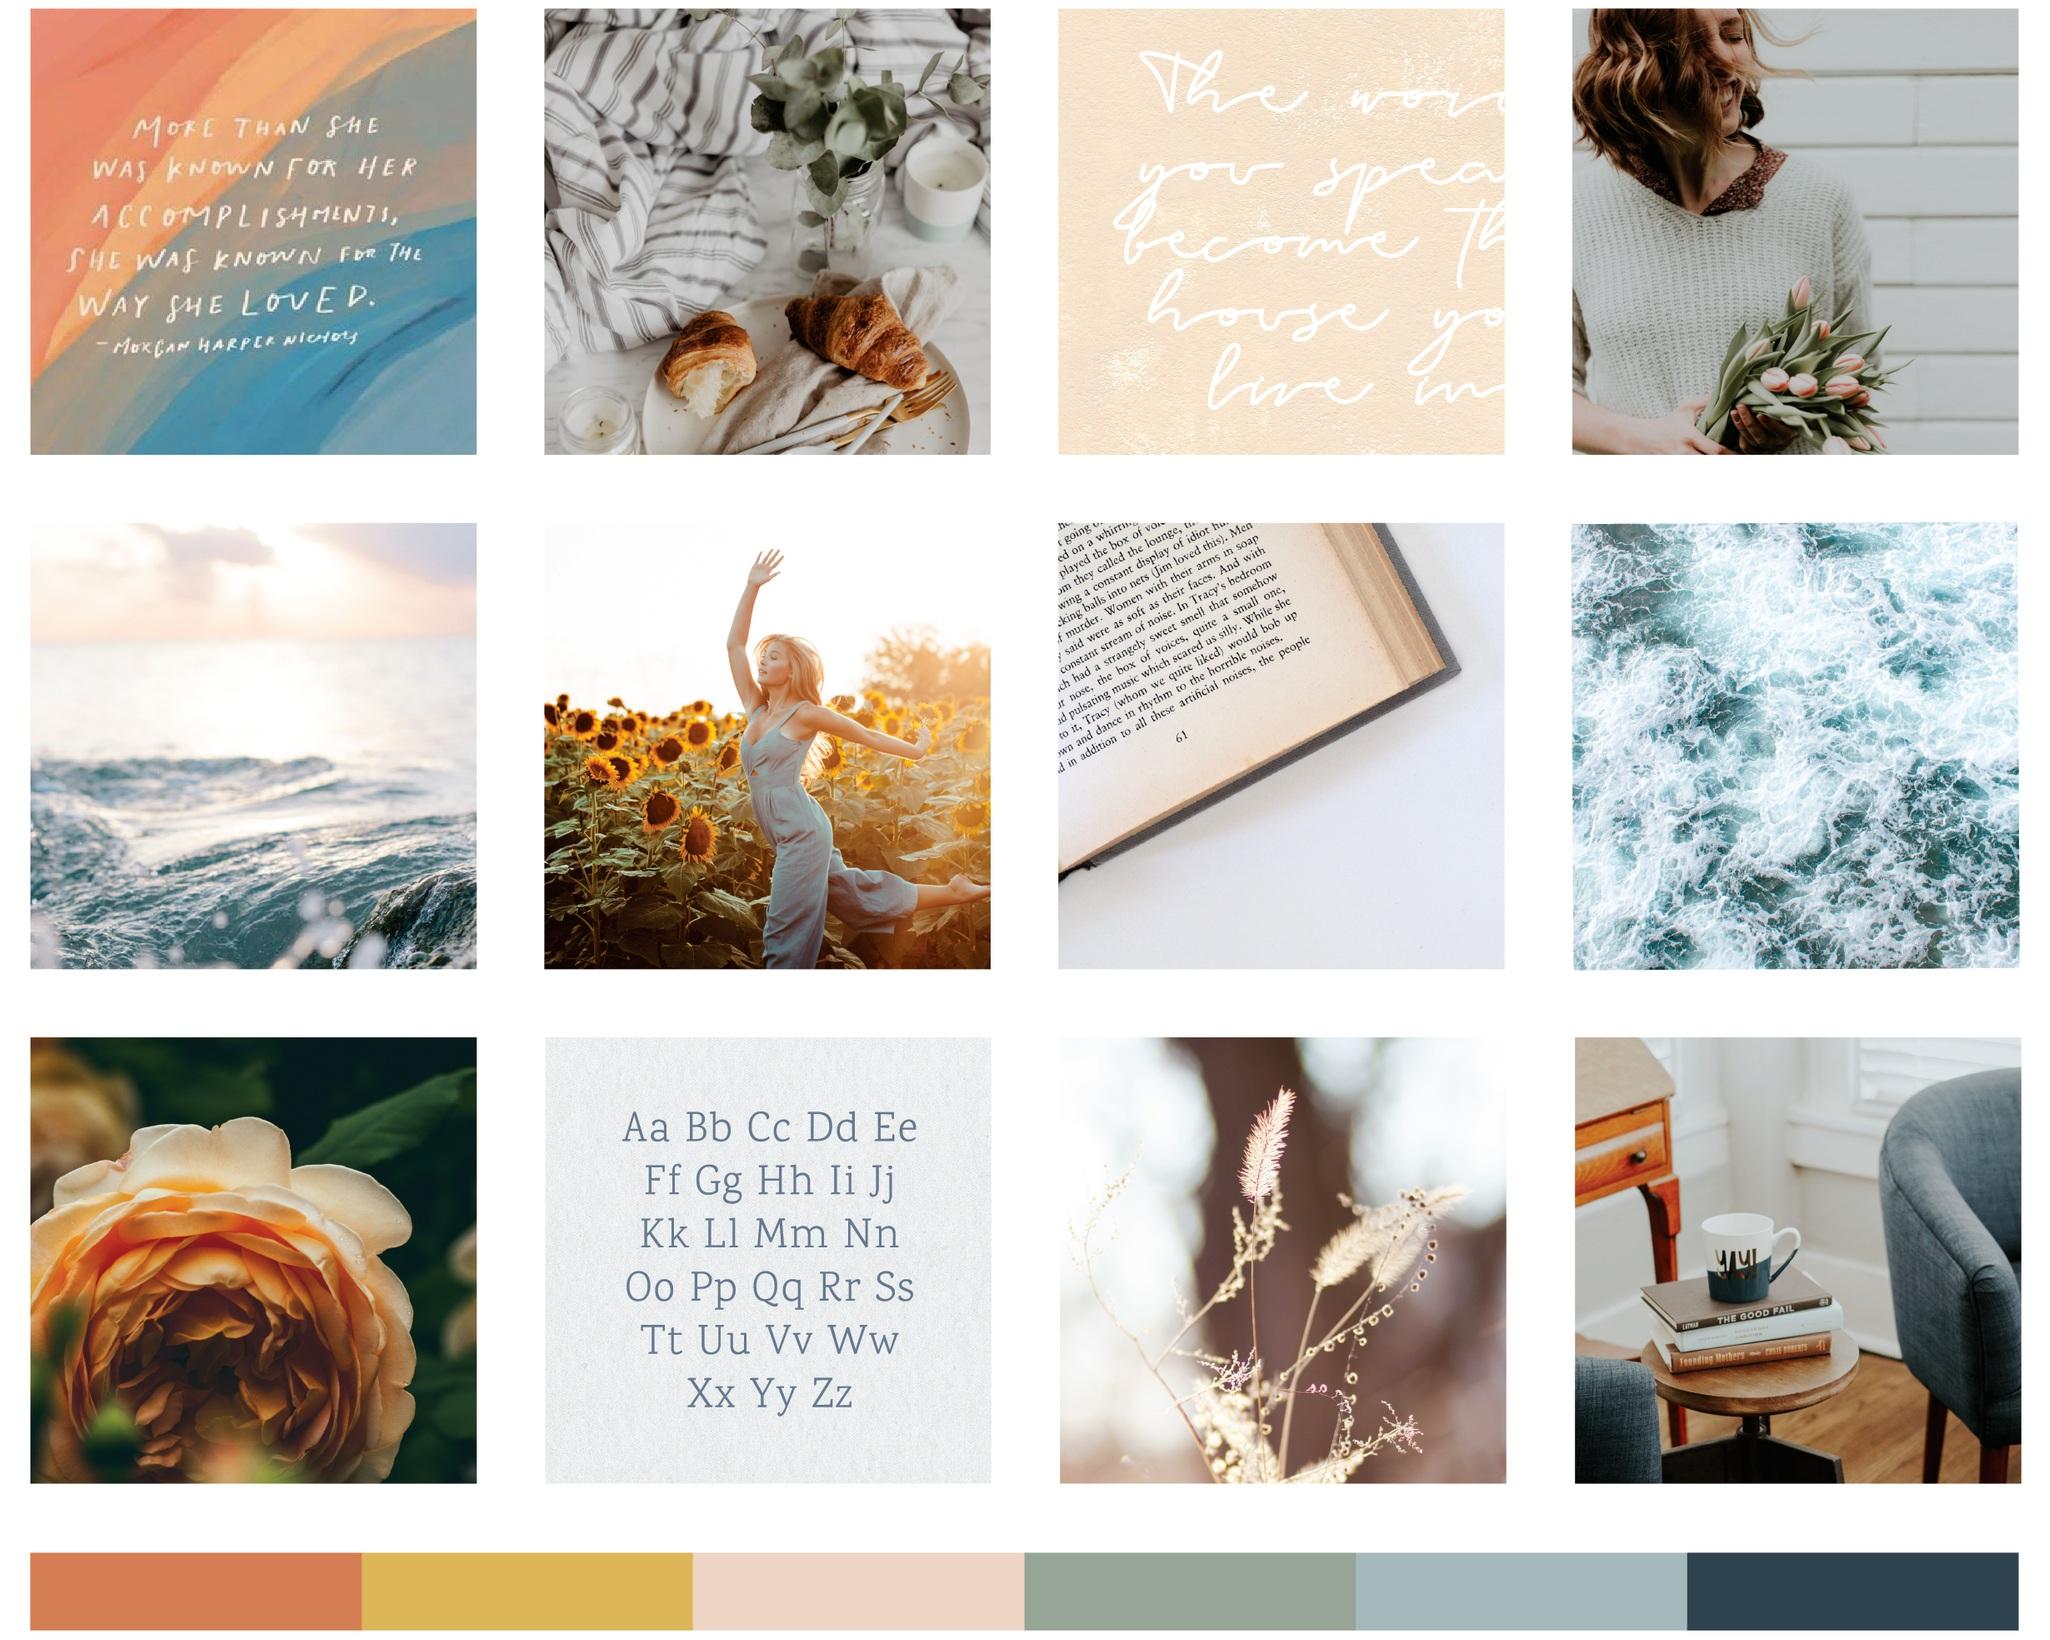 Foxtrot+Branding+Design+Moodboard